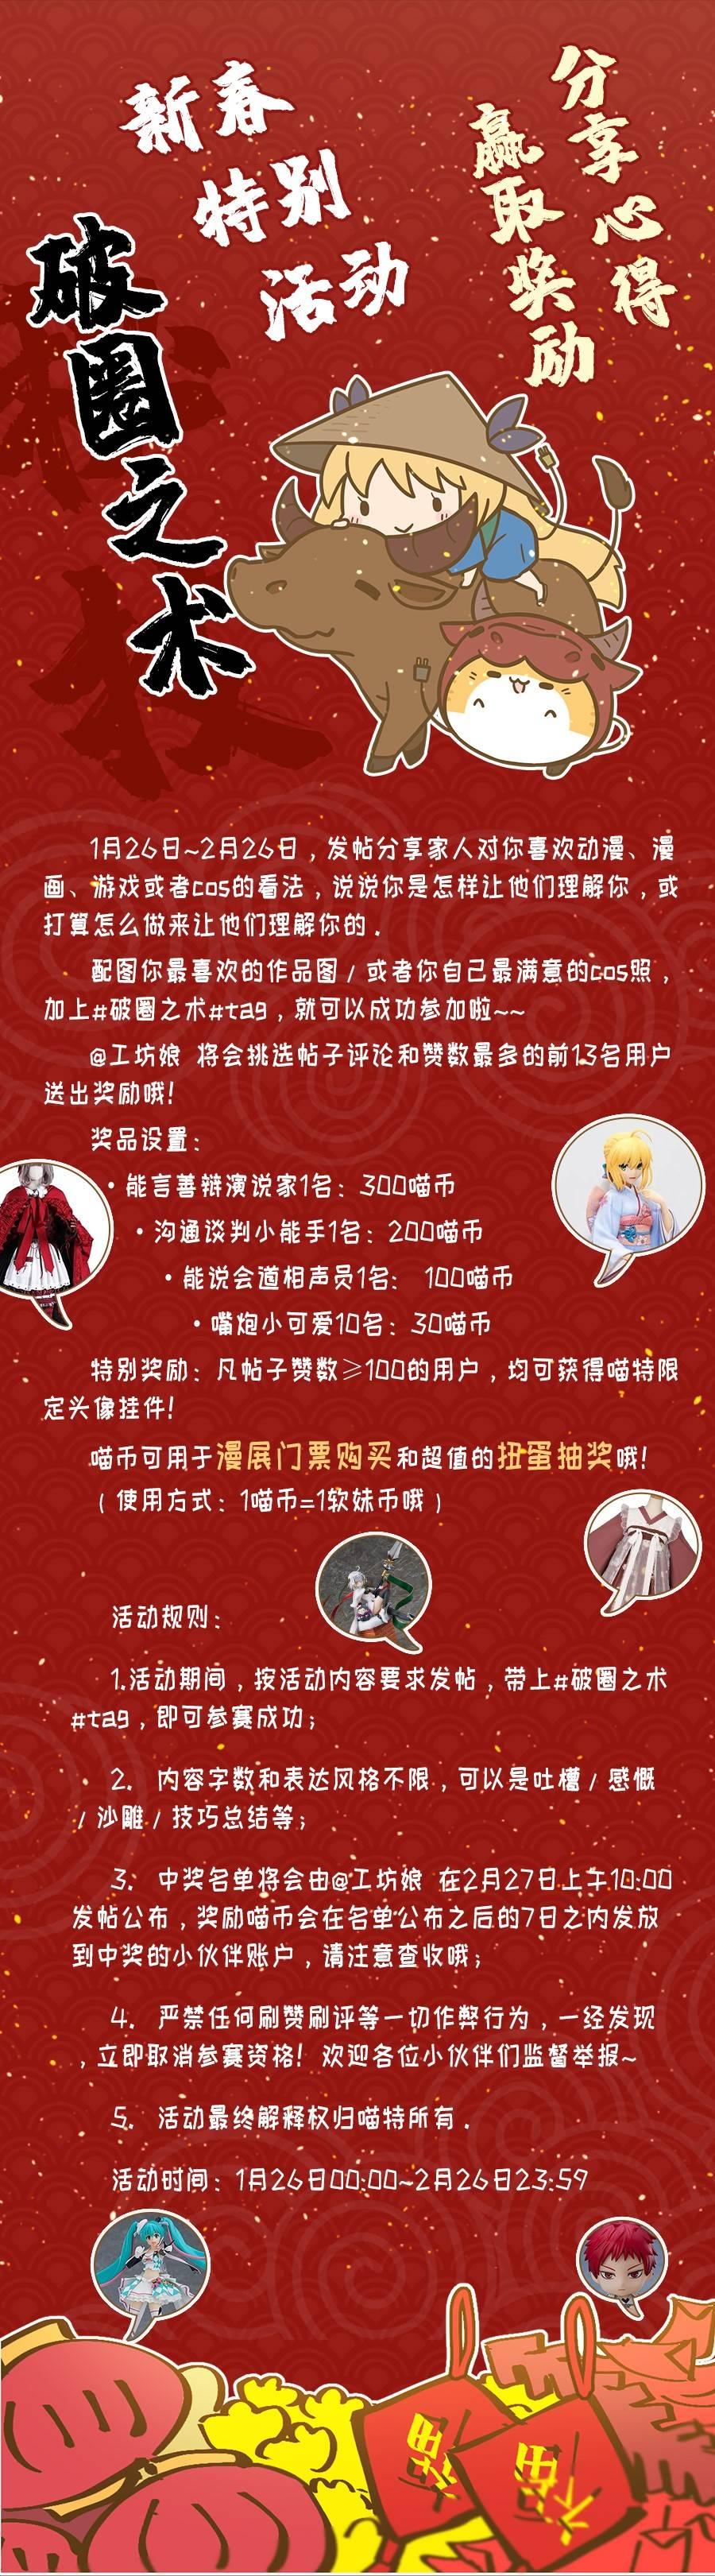 2020011617-春节BANNER_900xn (1).jpg